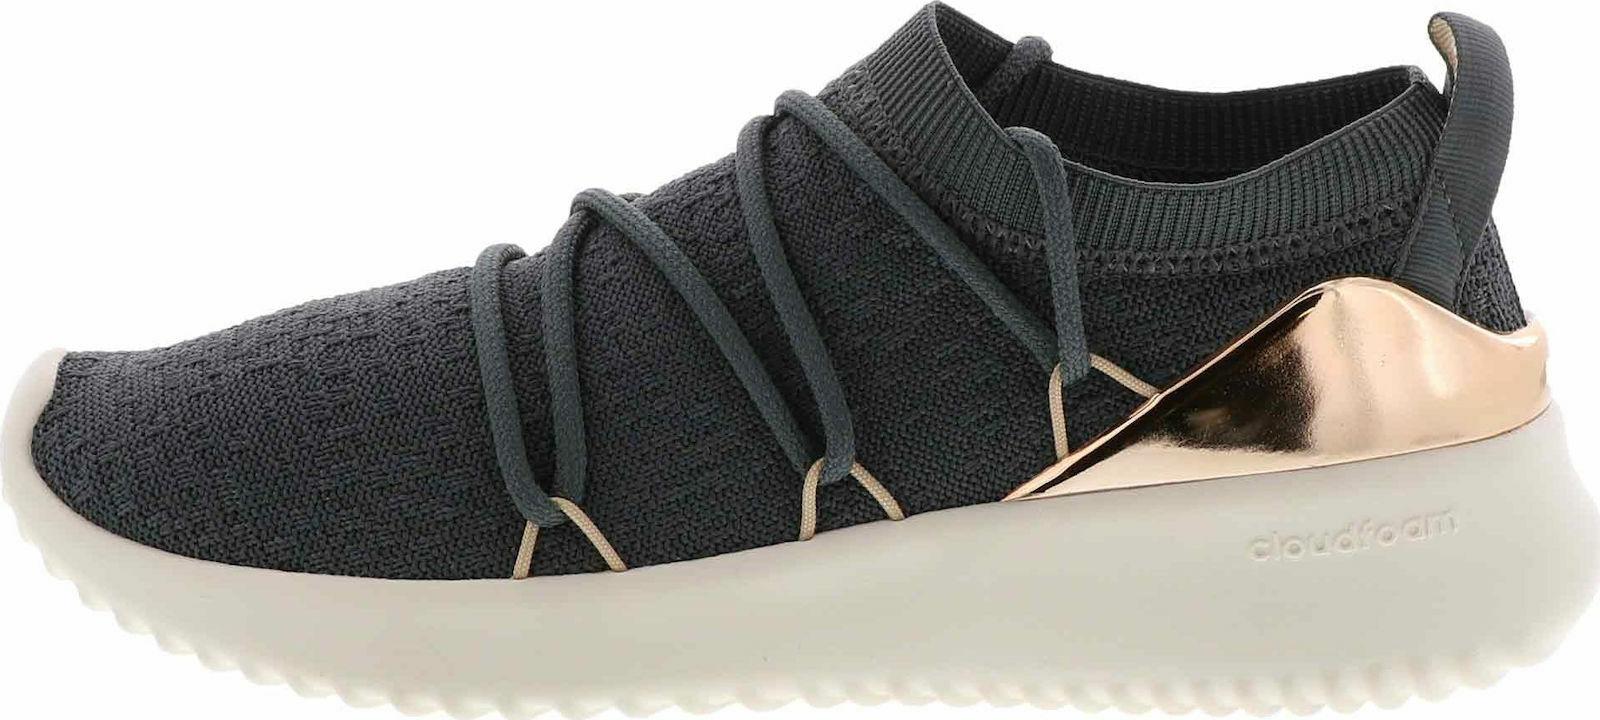 Adidas donna Running scarpe Ultimamotion scarpe Slip-on scarpe da ginnastica Gym New F37037